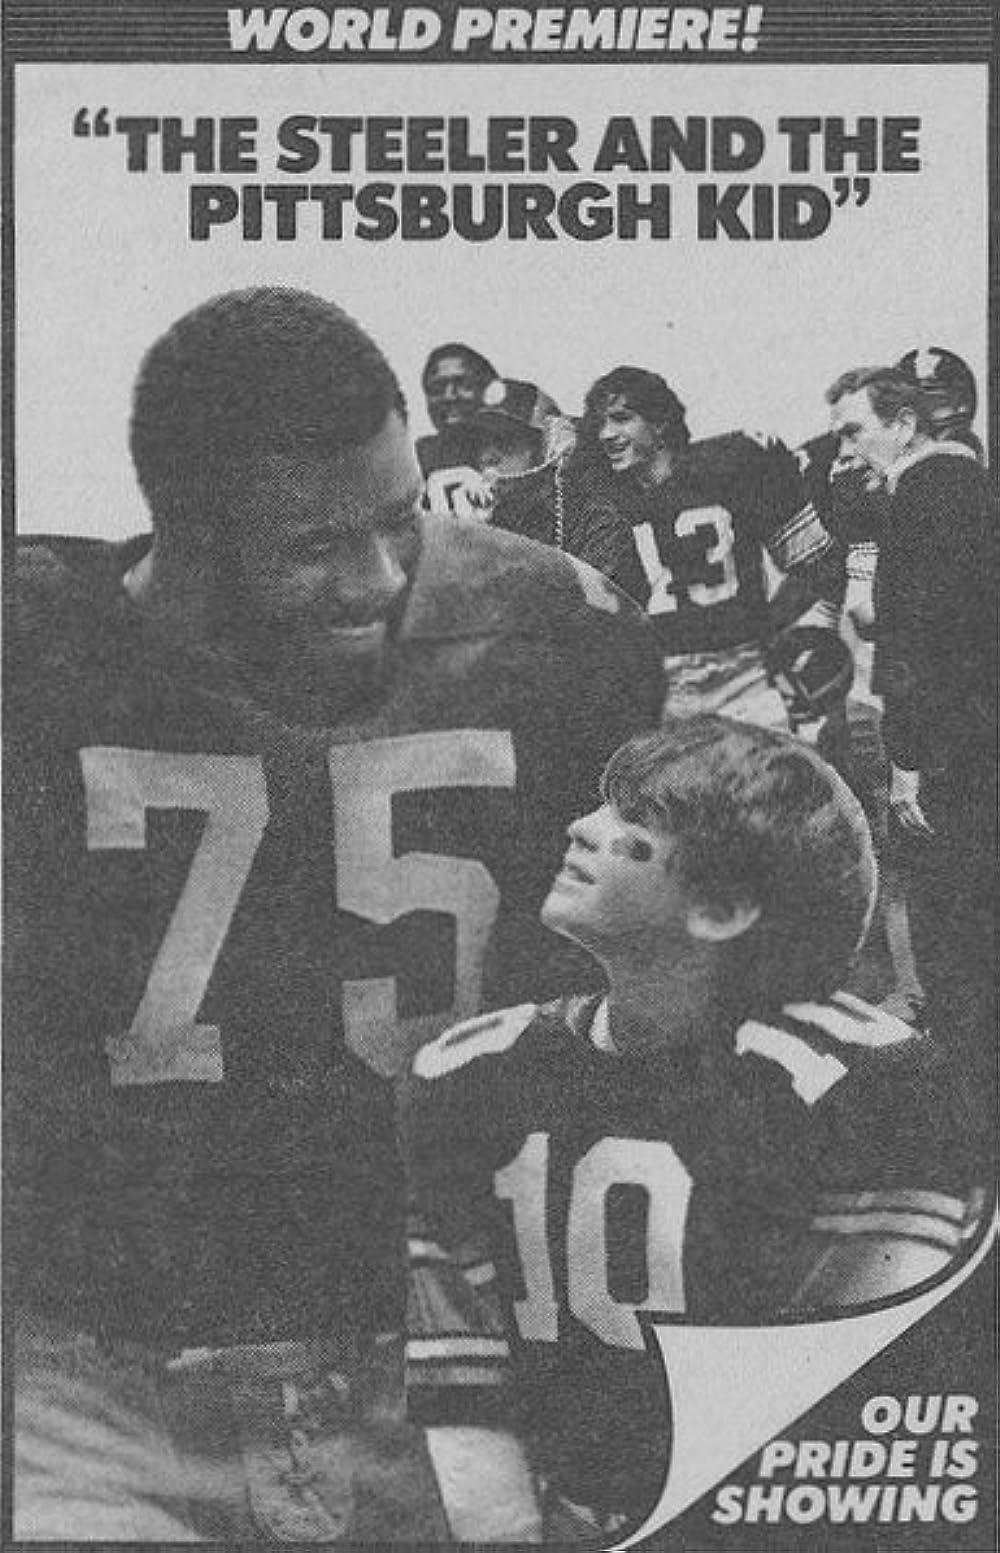 The Steeler and the Pittsburgh Kid (TV Movie 1981) - IMDb